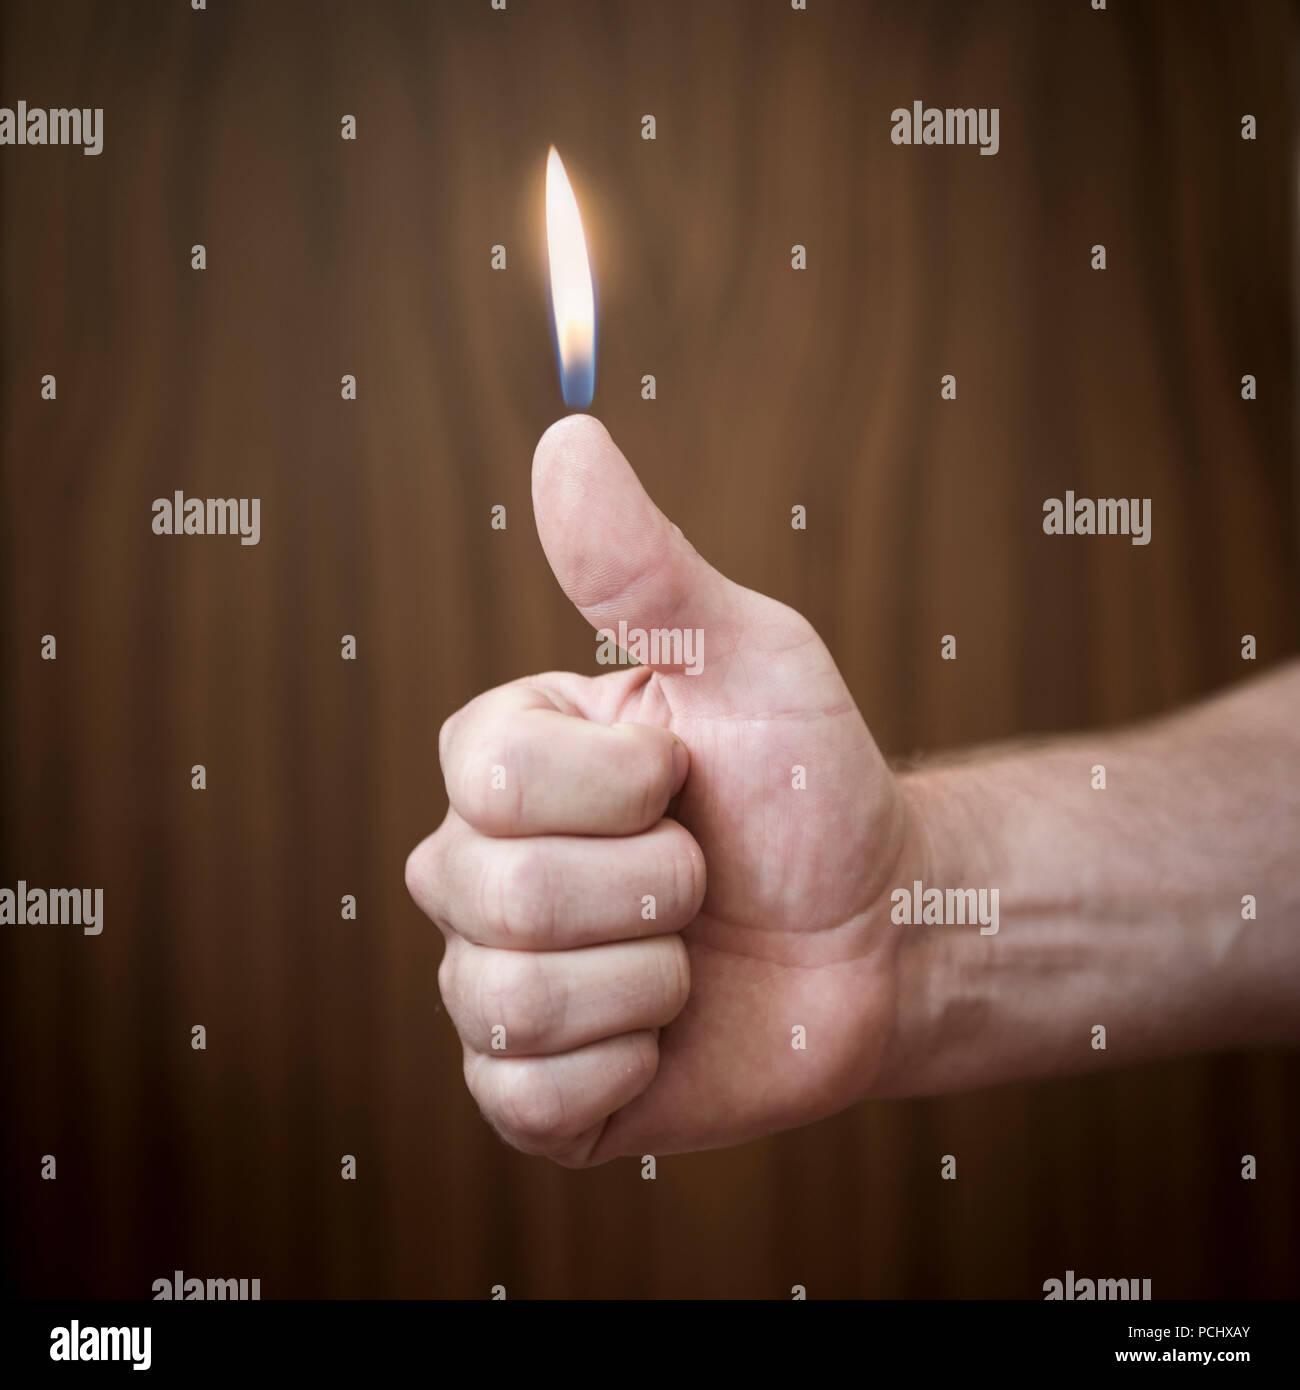 ideas,flame,human thumb,wick,burning - Stock Image